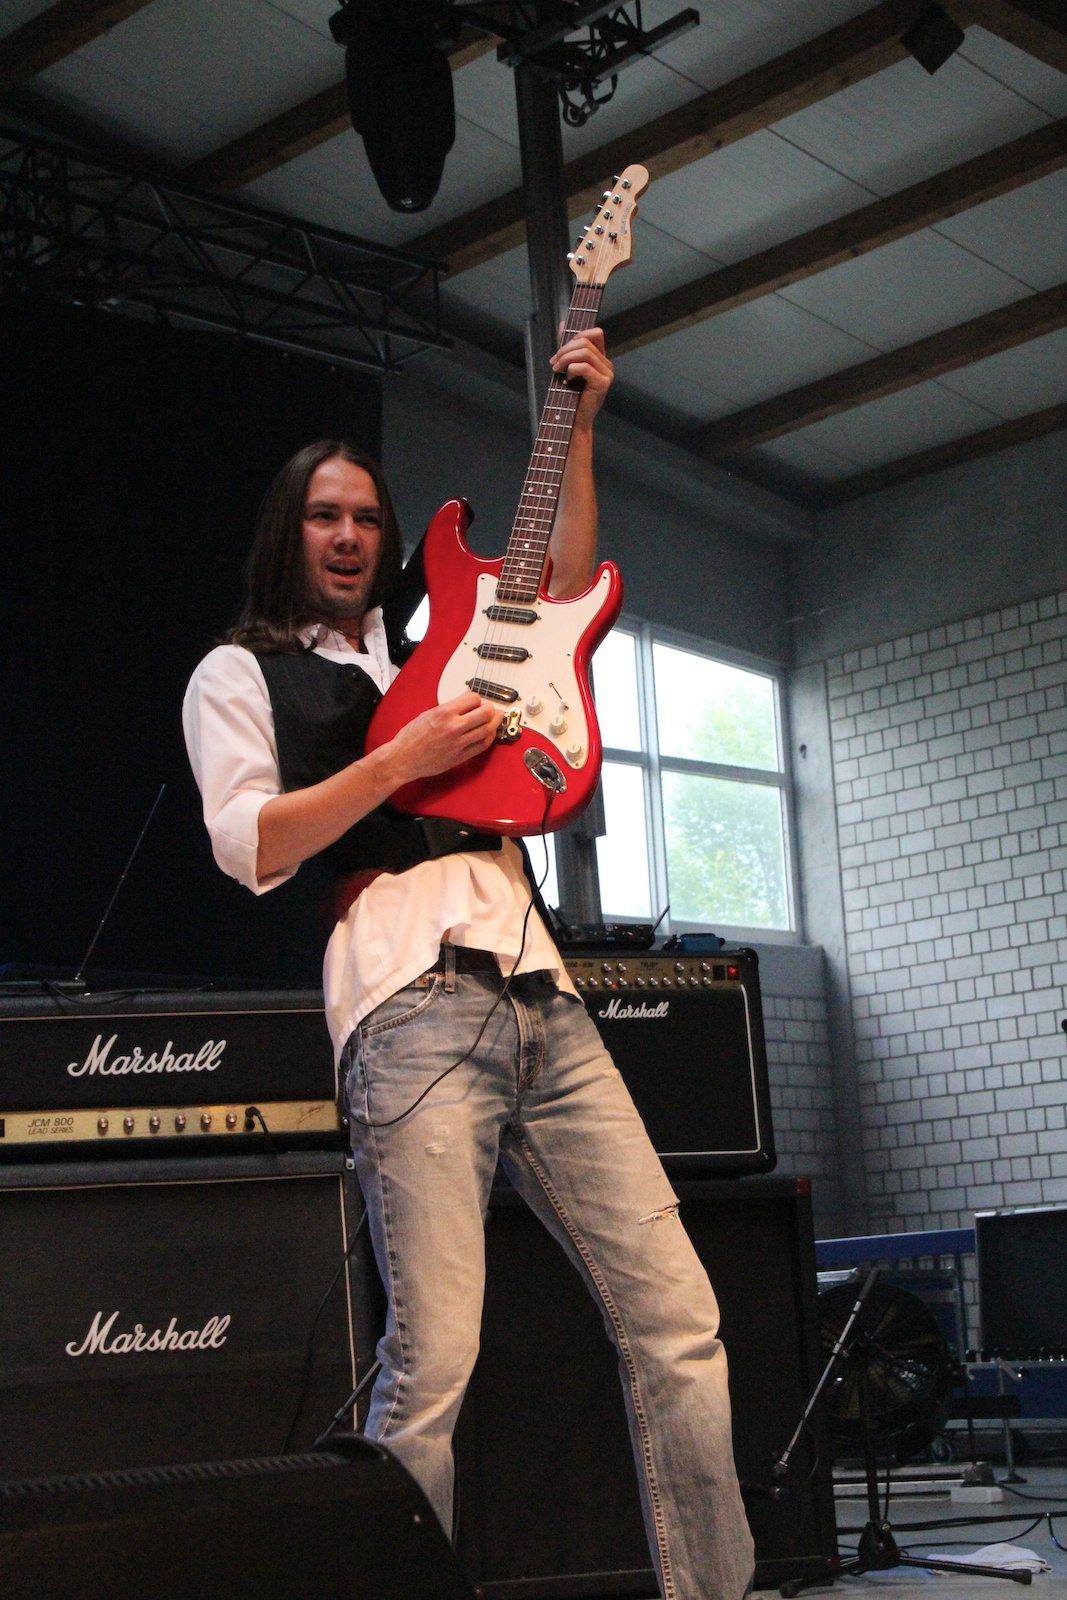 Stainless Quo - Sommerfesthalle, Otterstadt 18.06.2011 - 09